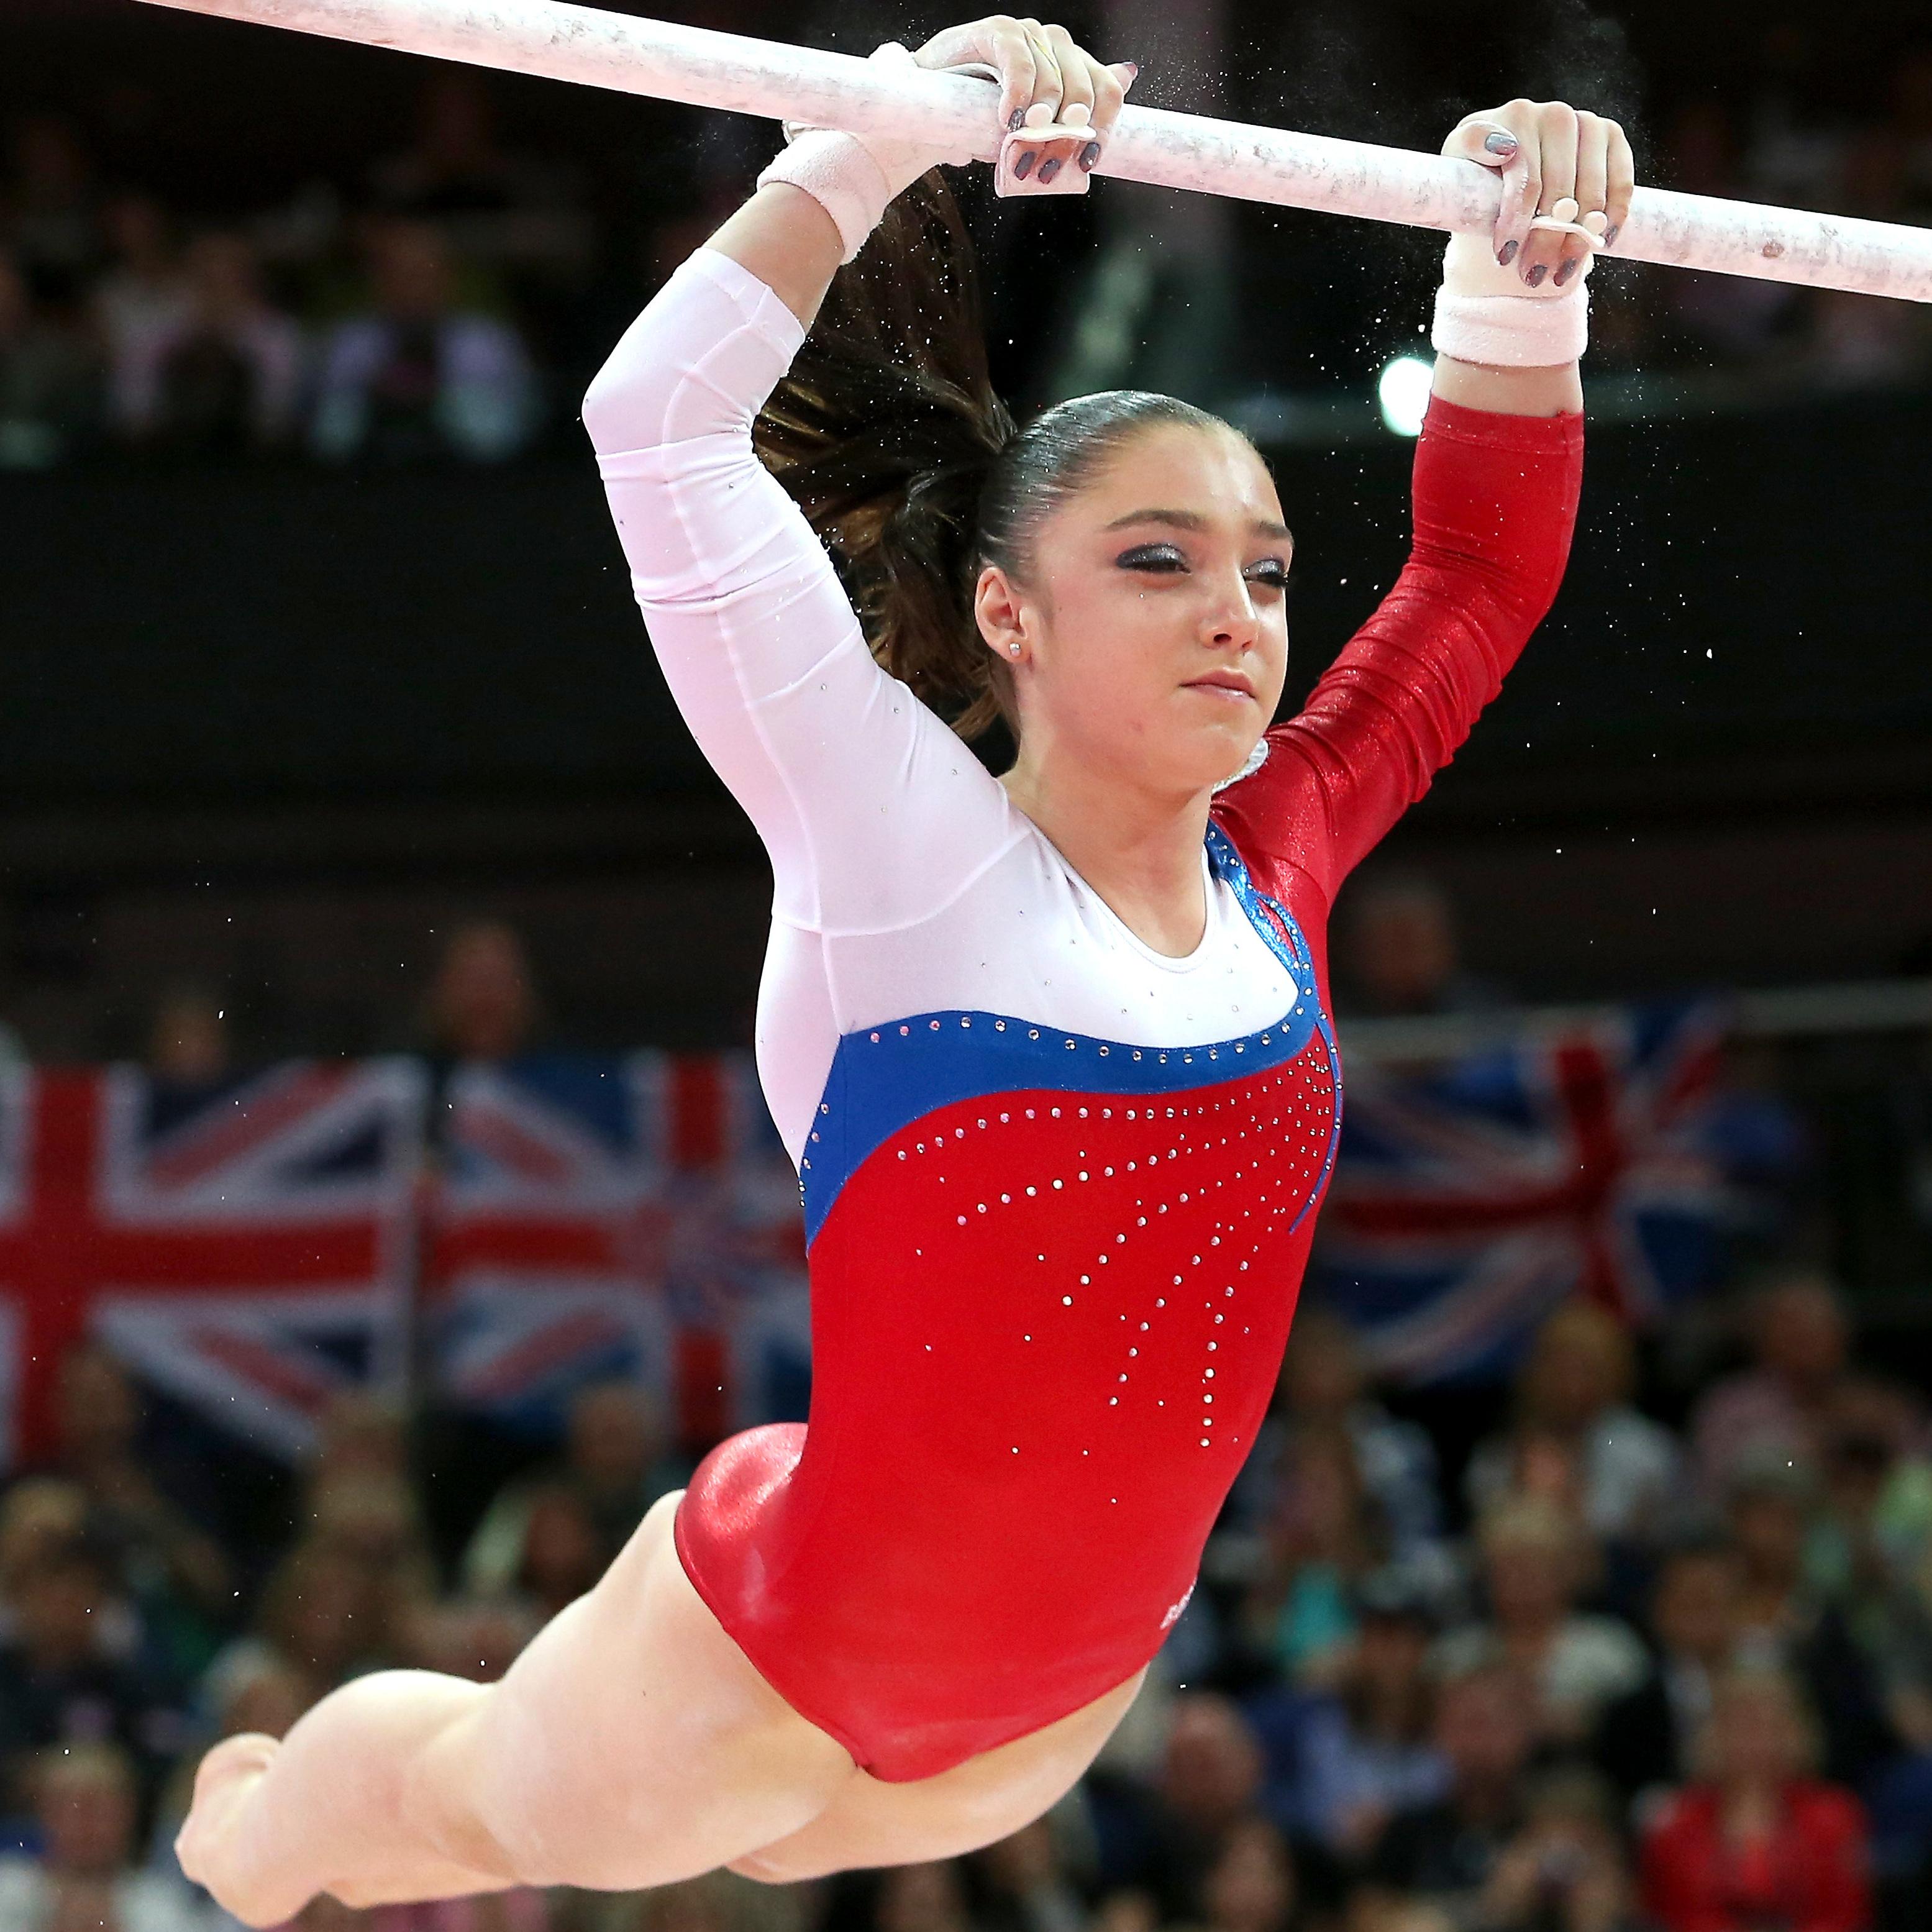 Rio Olympics 2016: Aliya Mustafina wins gold in uneven